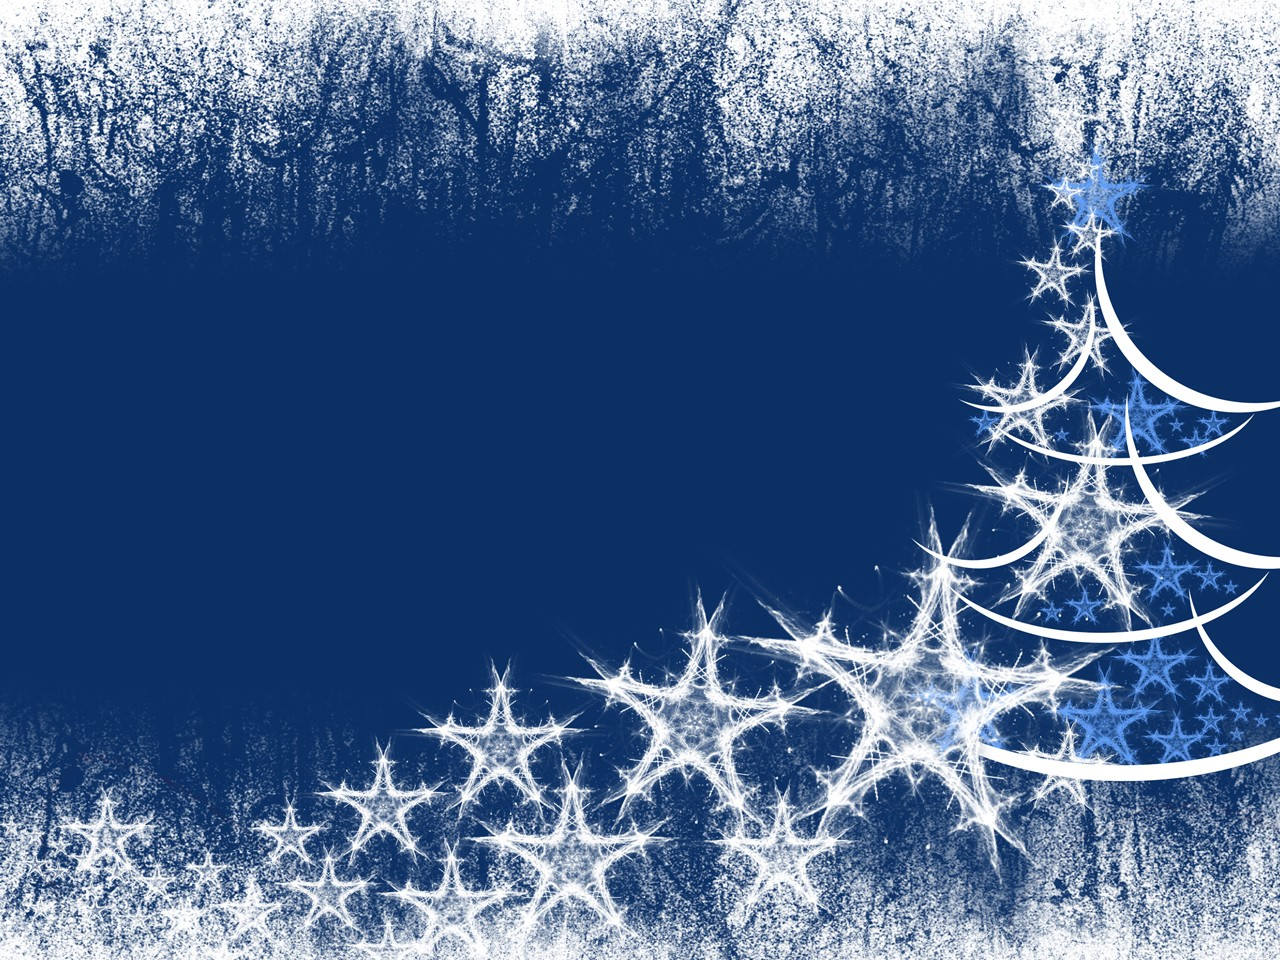 Artificial Christmas Trees 1280x960